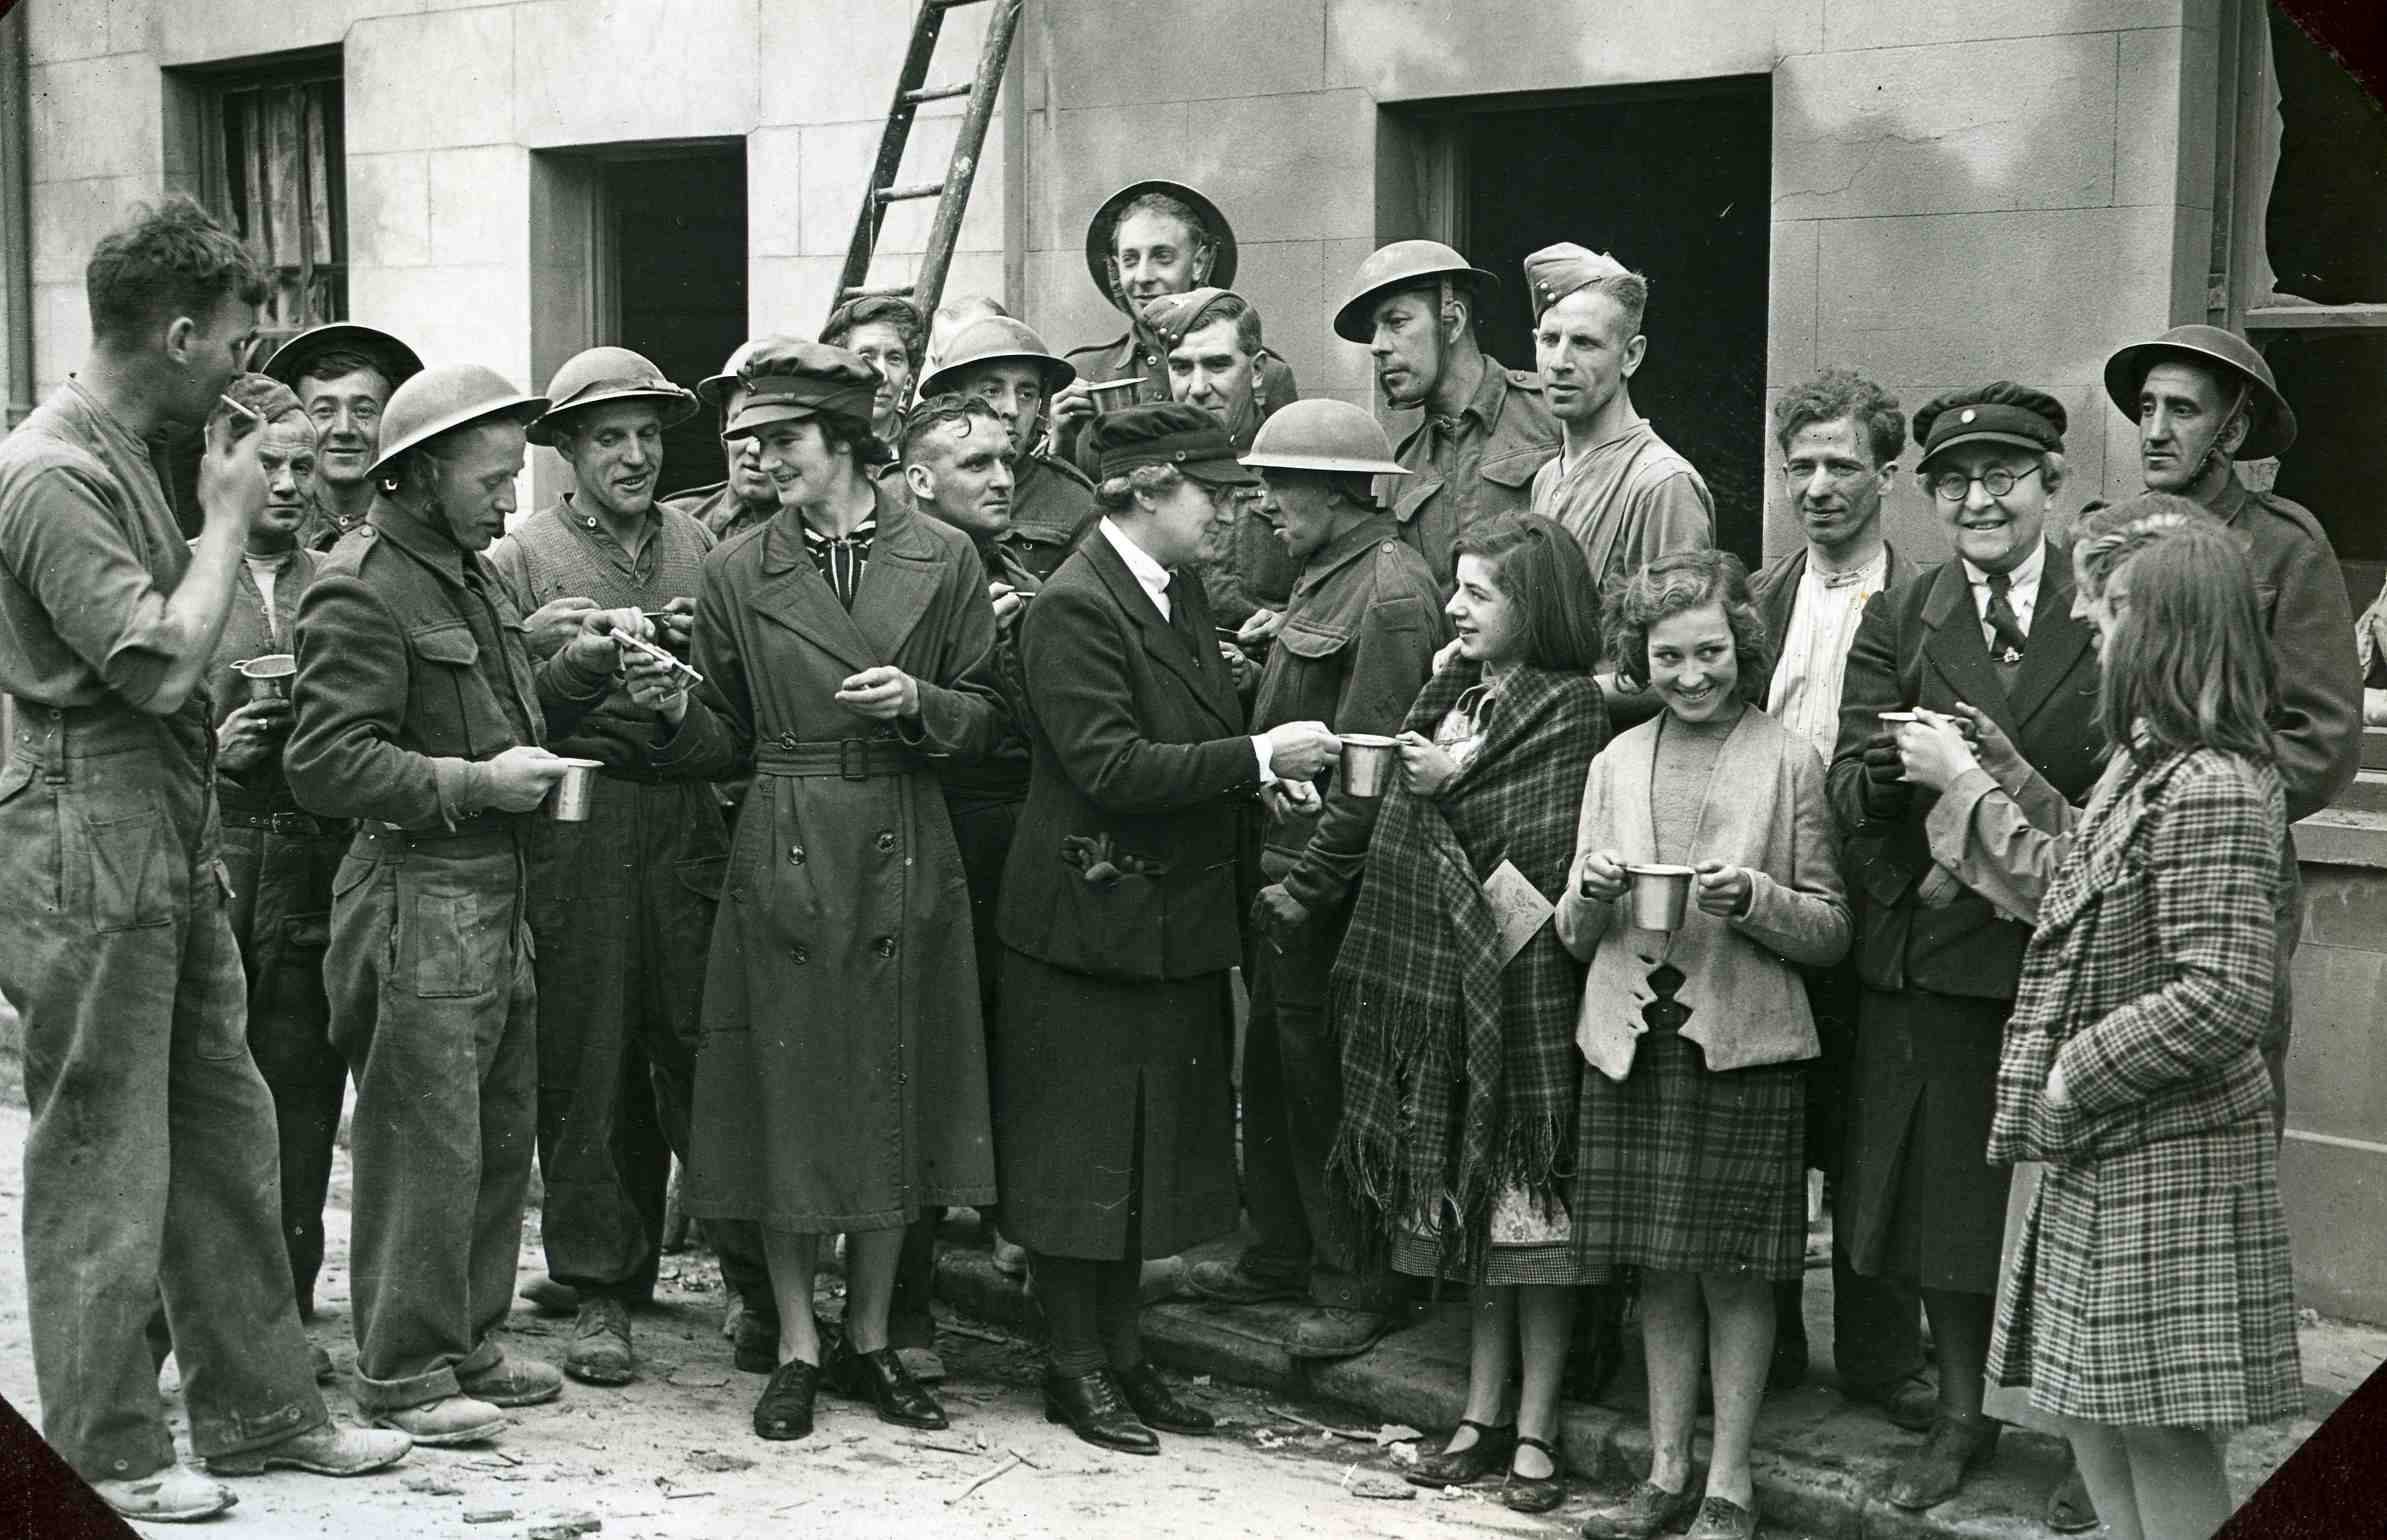 WA helpers in Brunswick Street after the bombing raids of December 1940